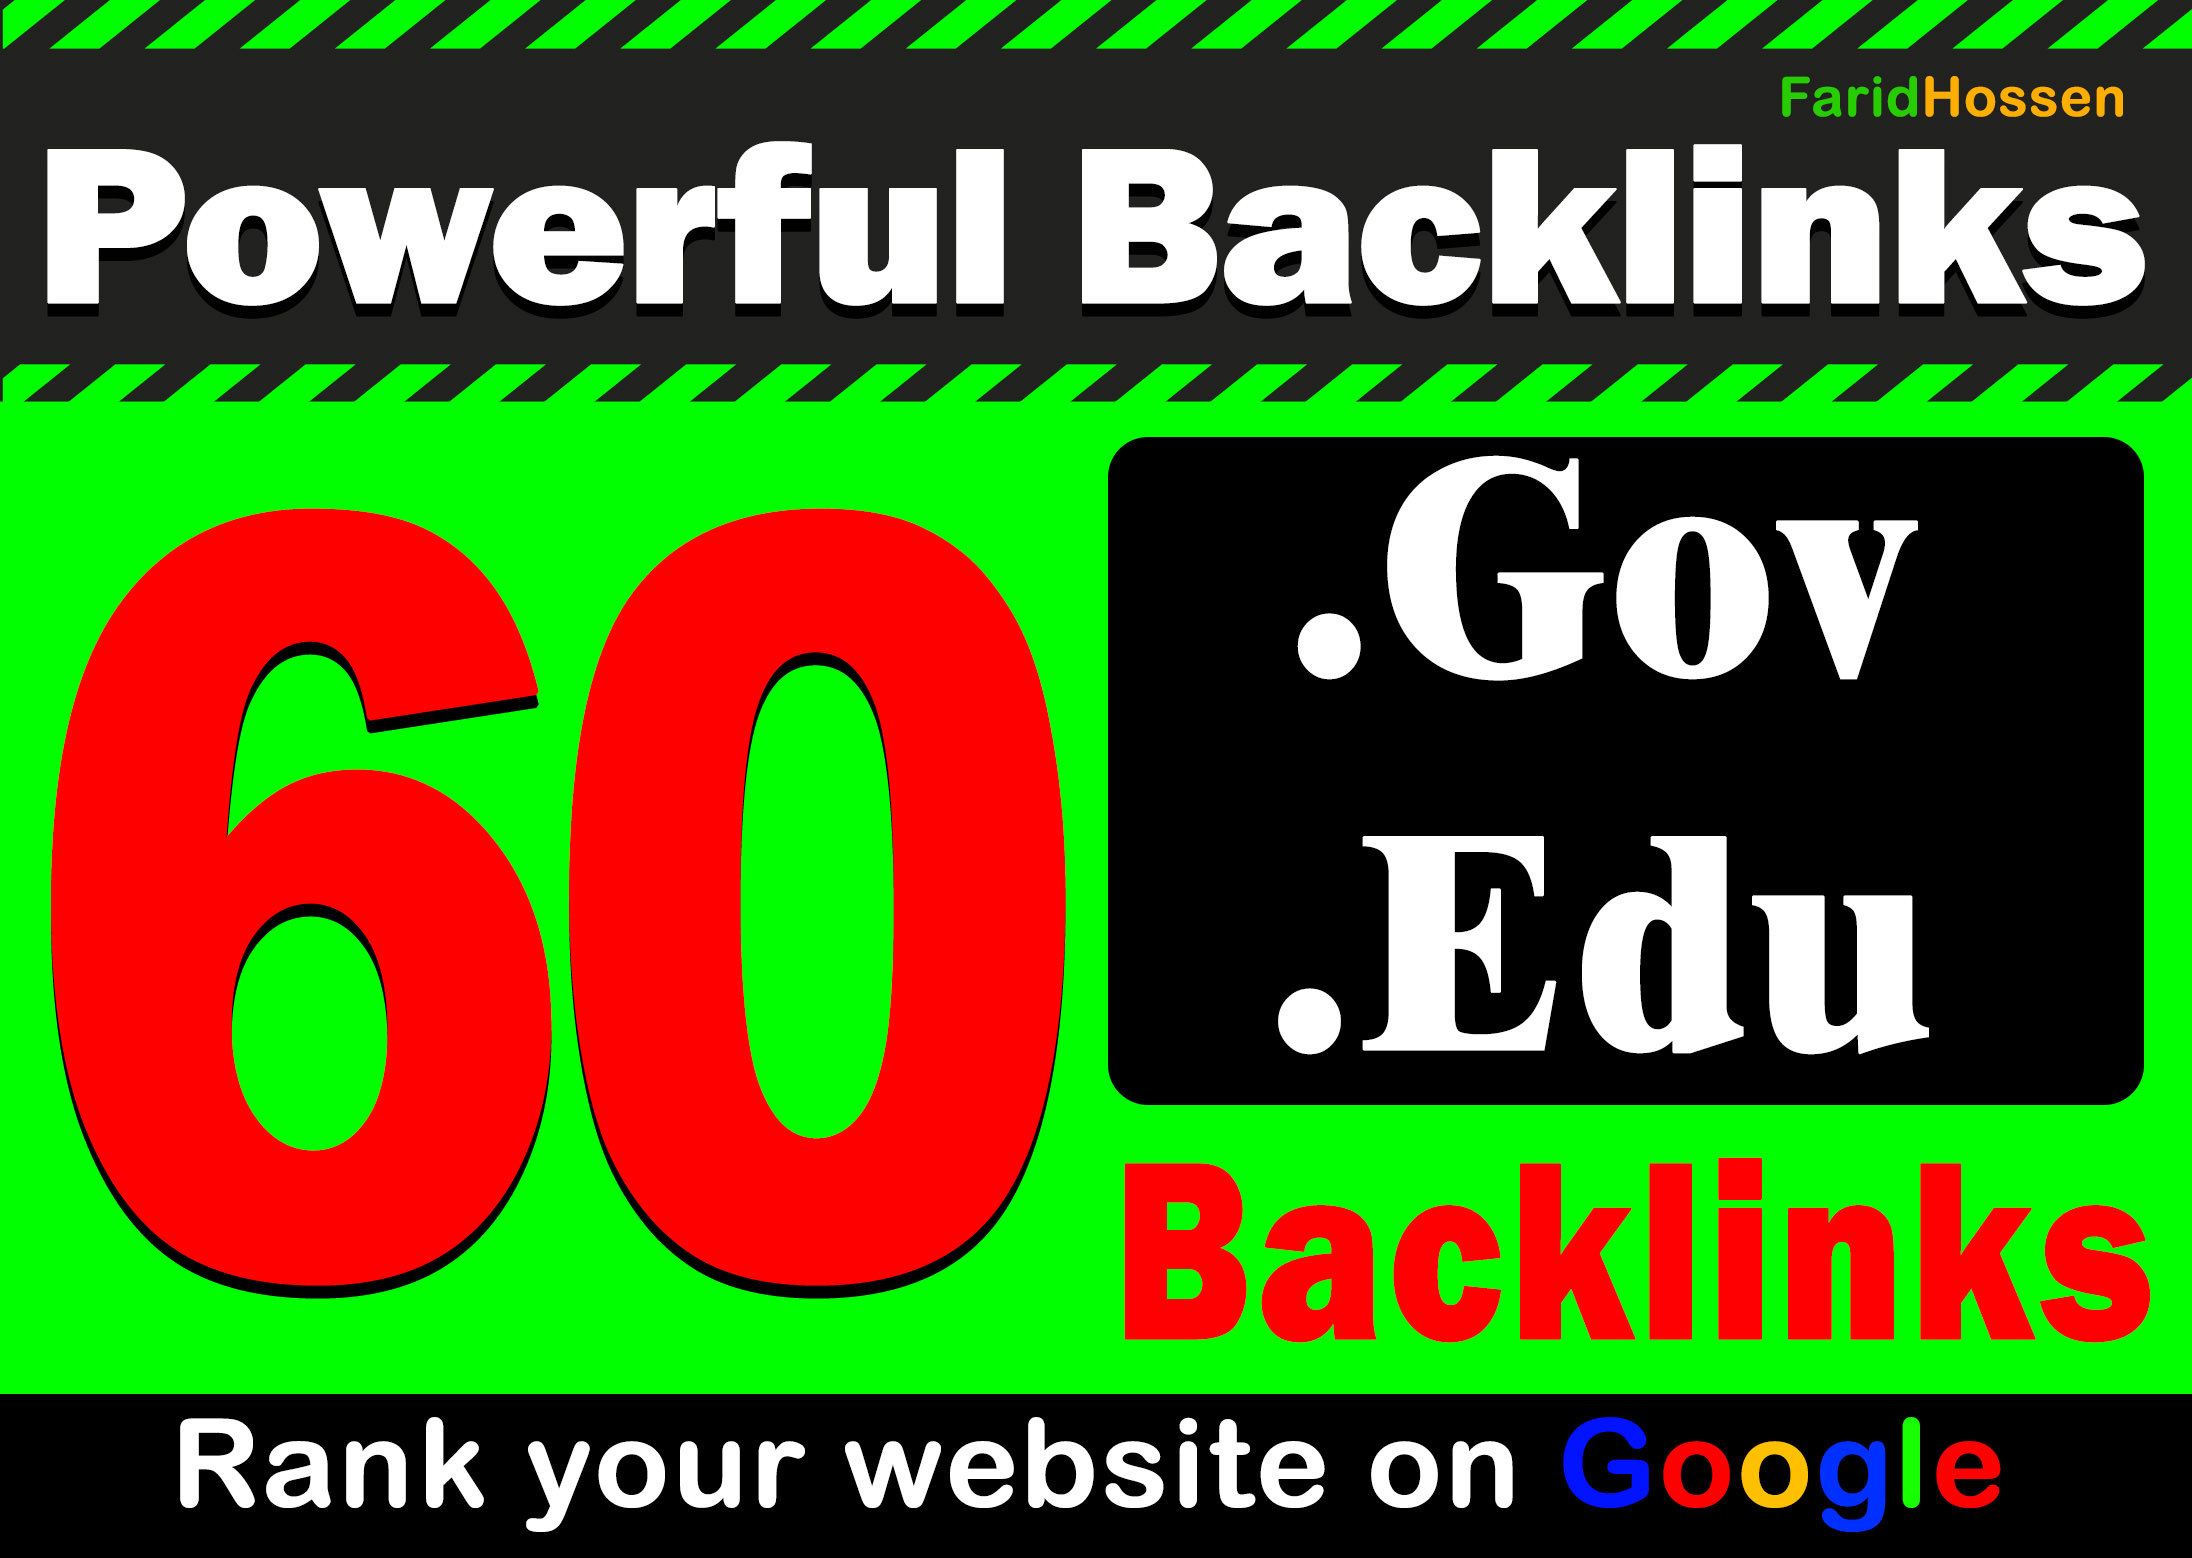 Manual 60 EDU GOV Backlinks for Rank Your Website on Google